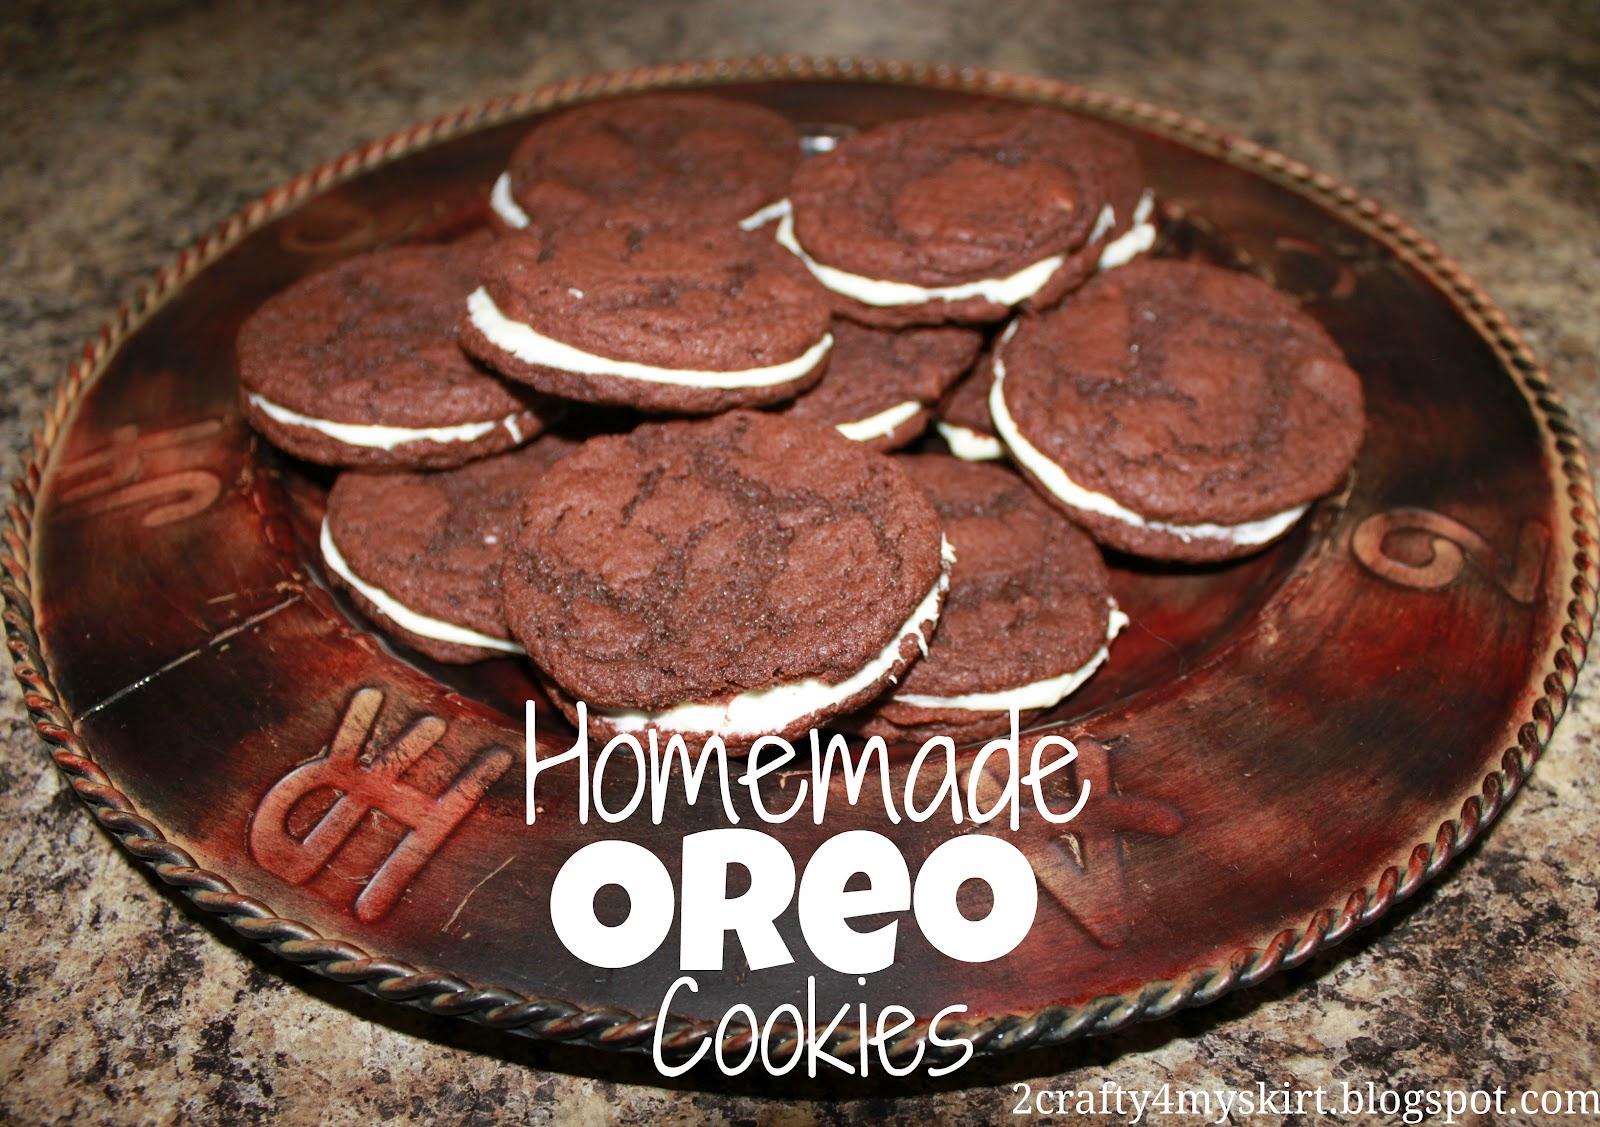 Homemade Oreo Cookies Betty Crocker Cake Mix